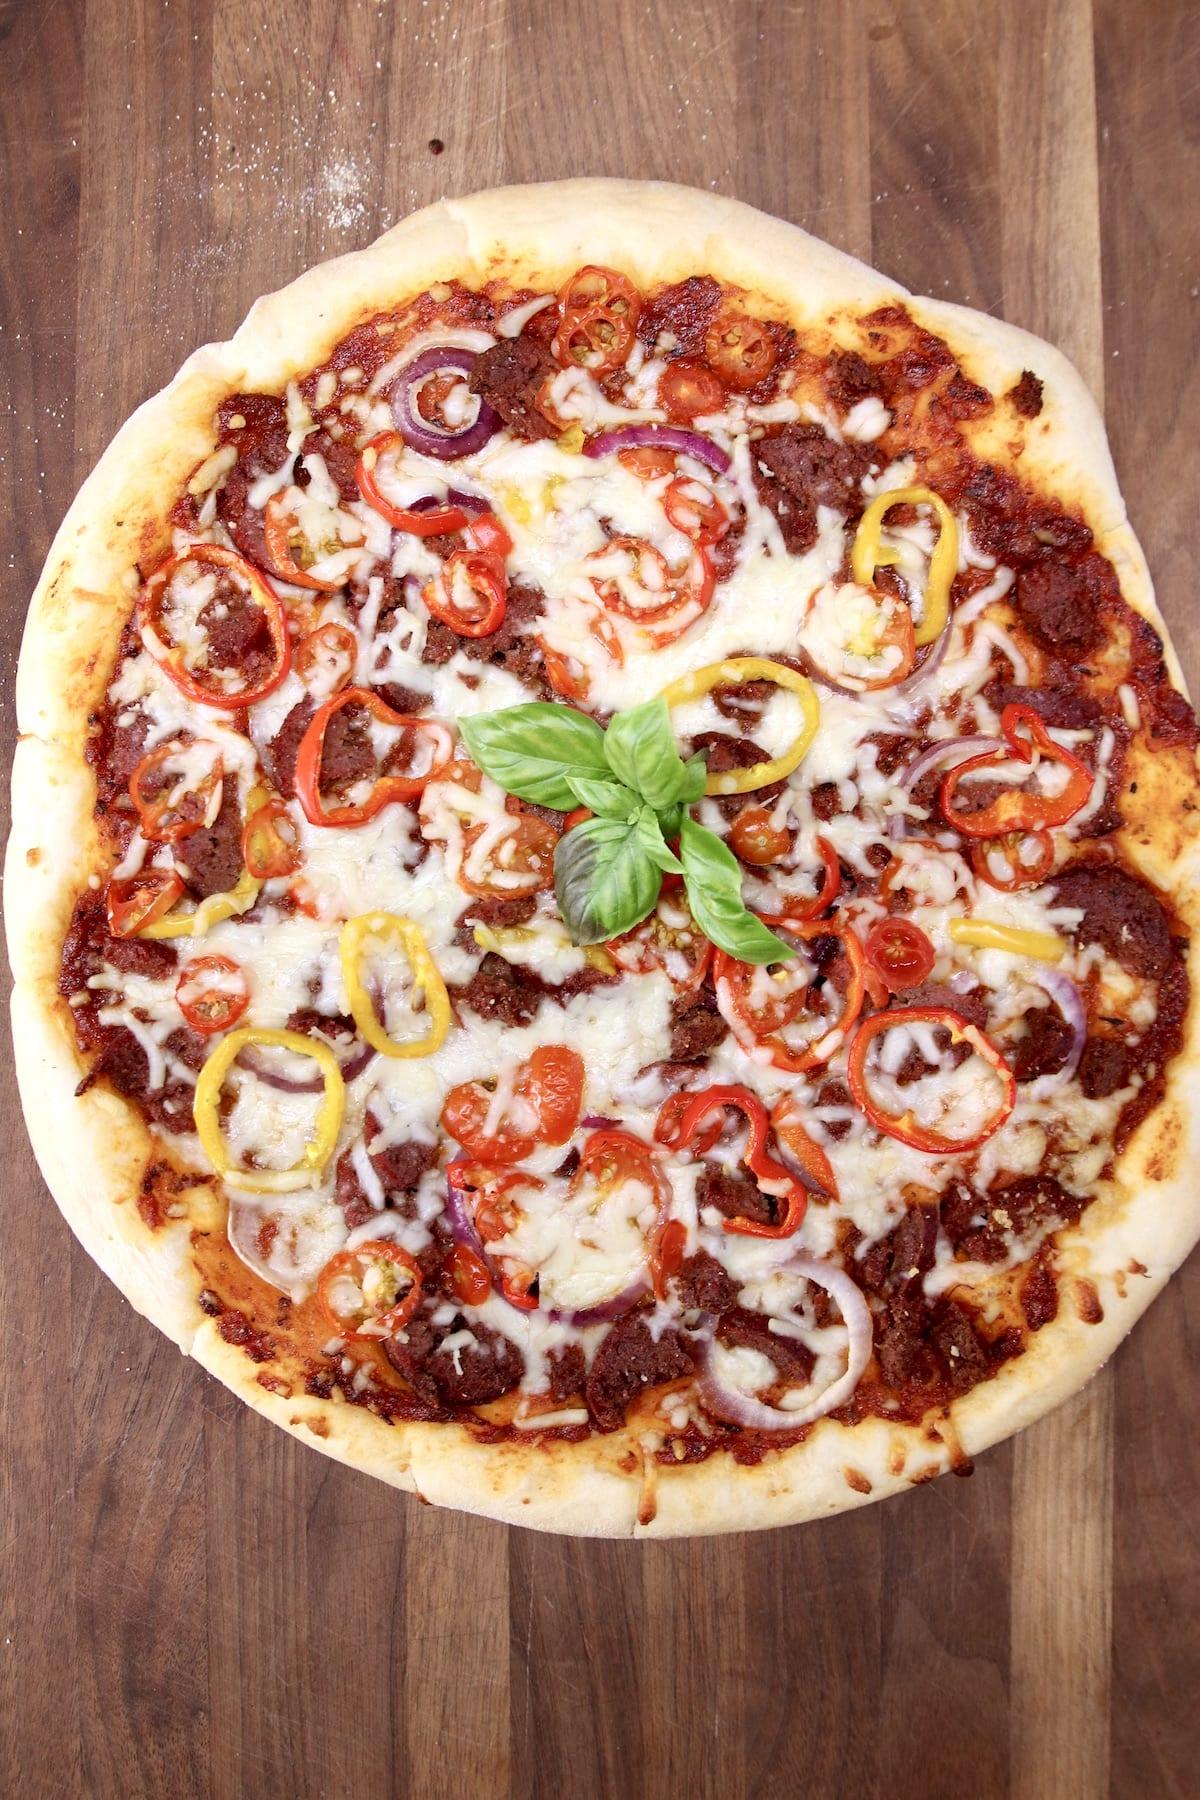 Grilled Pizza on a walnut cutting board